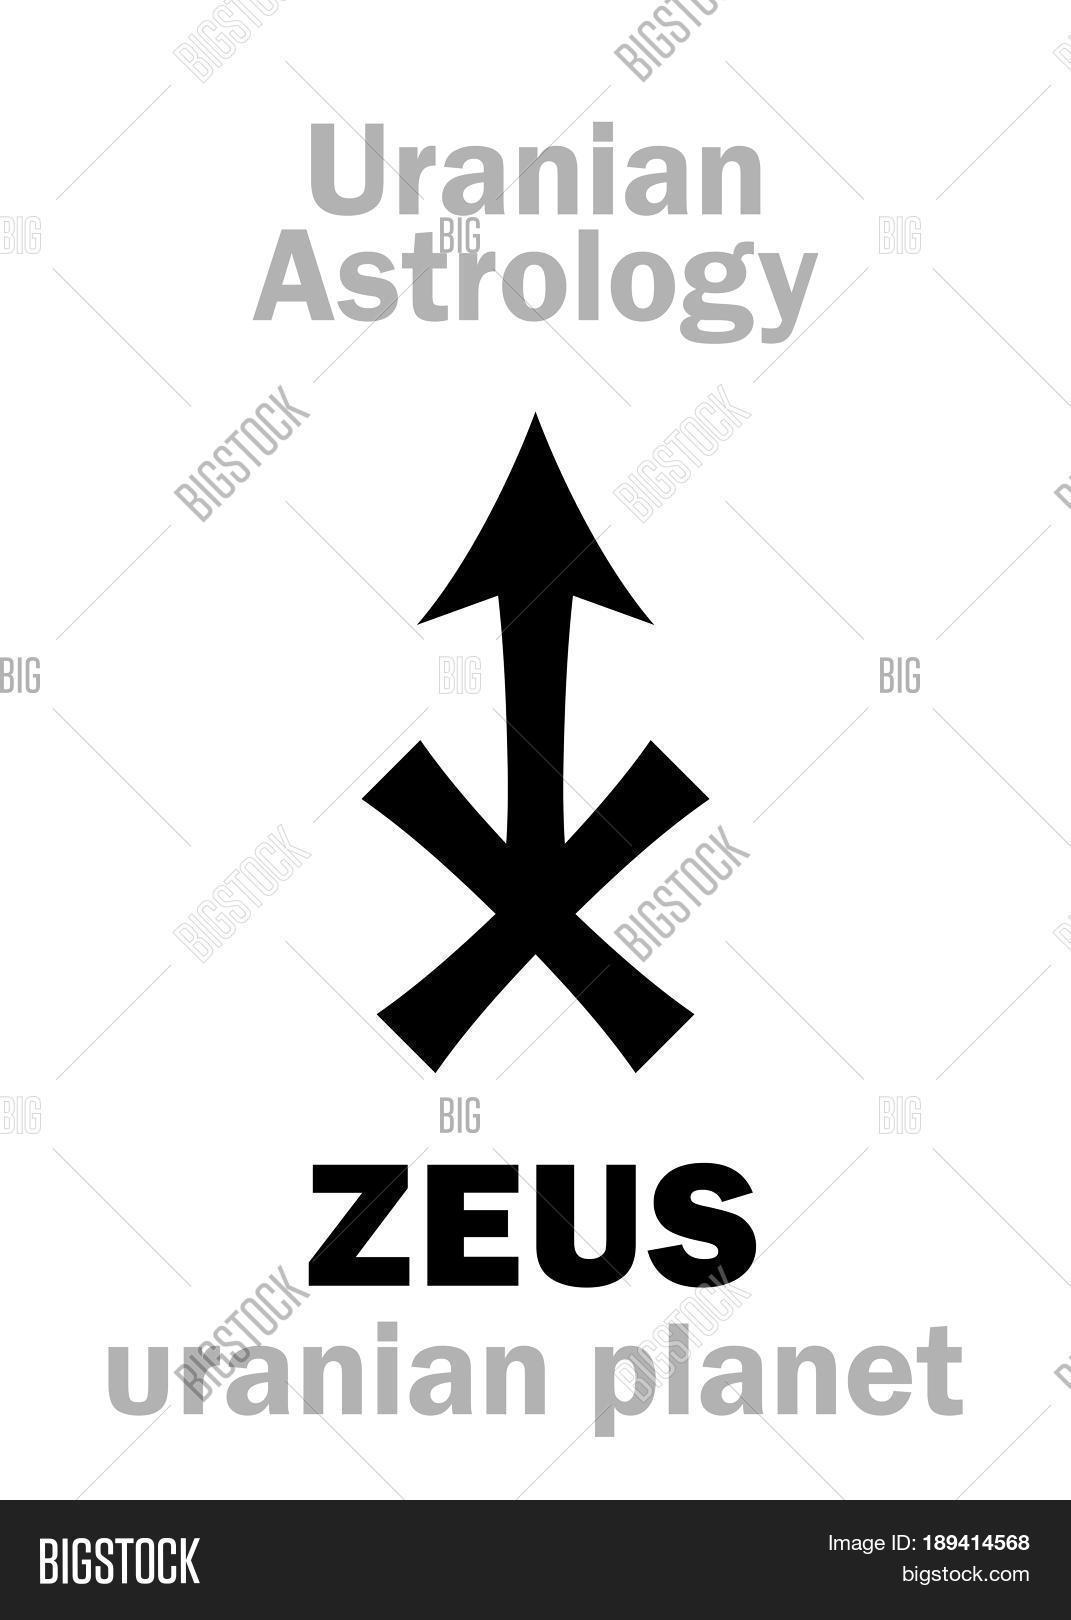 Astrology alphabet zeus uranian vector photo bigstock astrology alphabet zeus uranian planet trans neptunian point hieroglyphics character buycottarizona Images